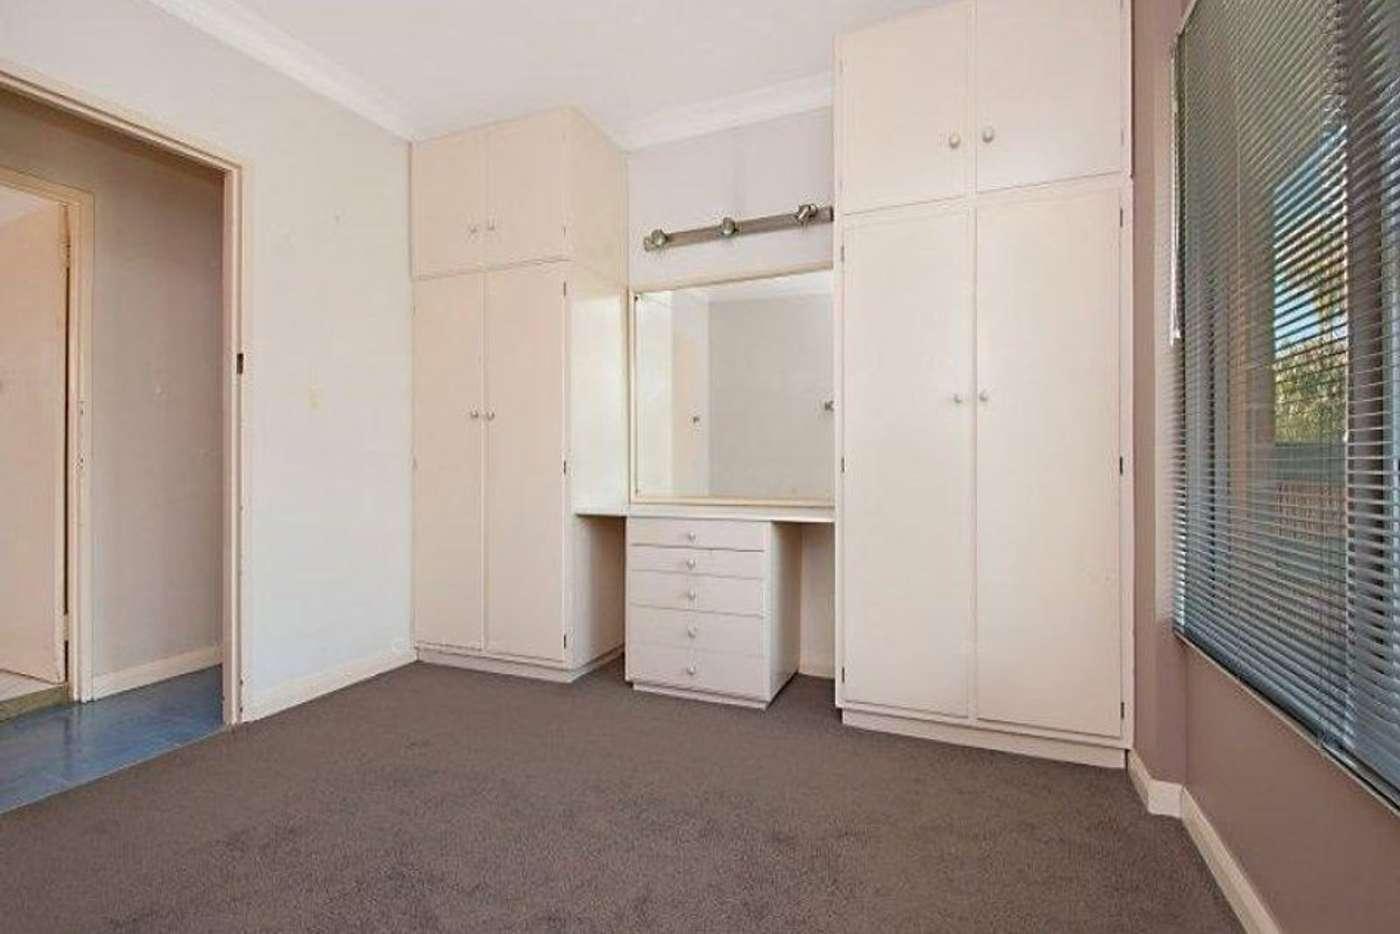 Sixth view of Homely unit listing, 13/16 L'Estrange Street, Glenside SA 5065